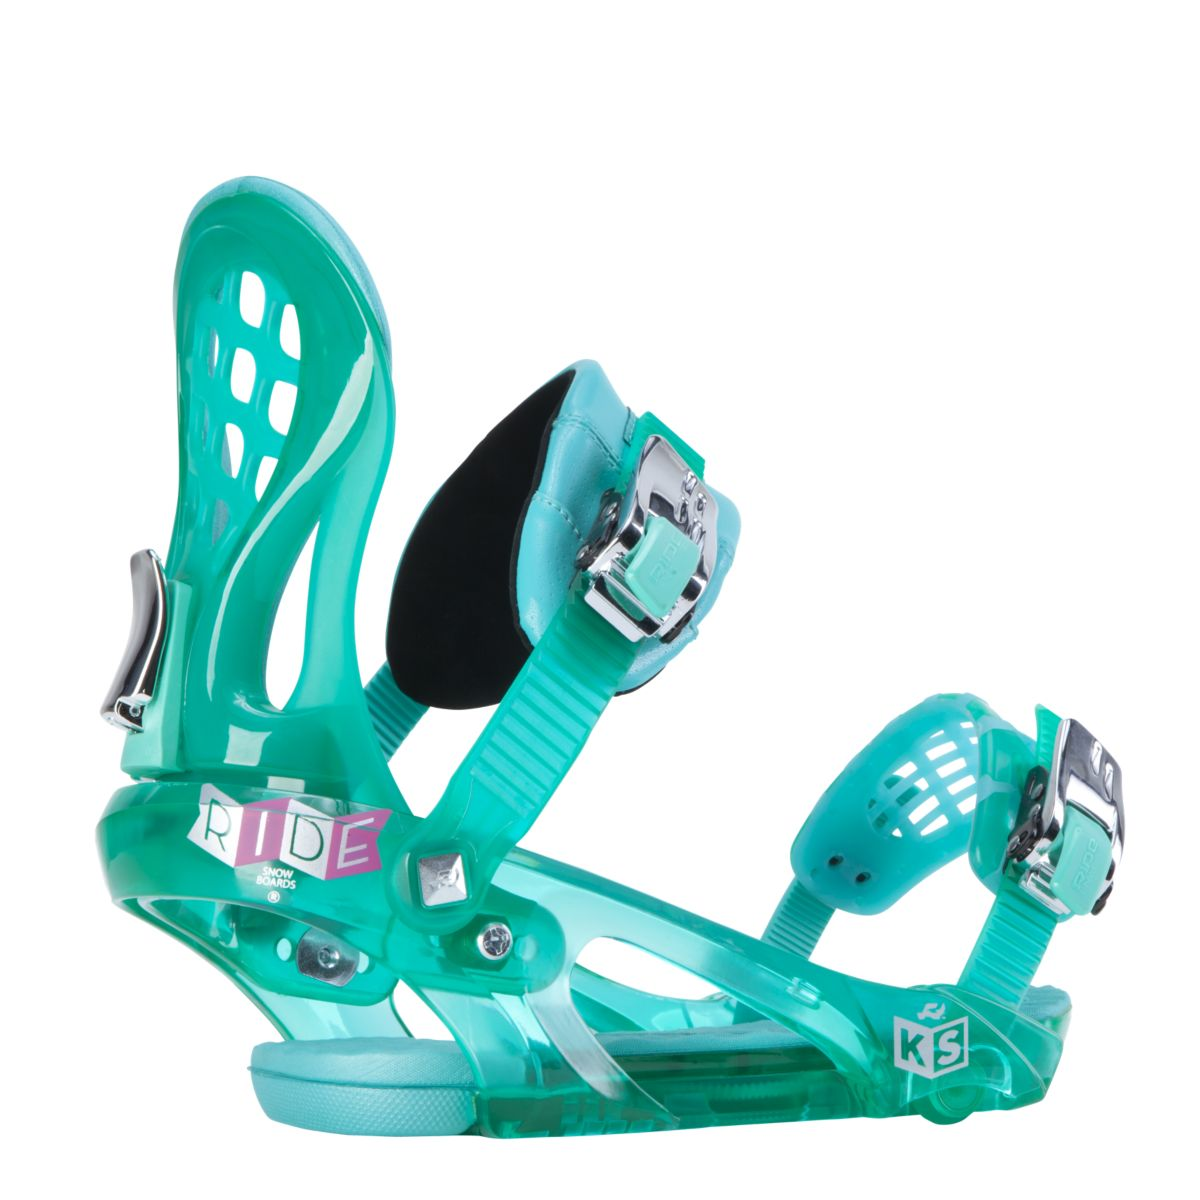 4ef355dc44f2 Ride KS Womens Snowboard Binding 2014